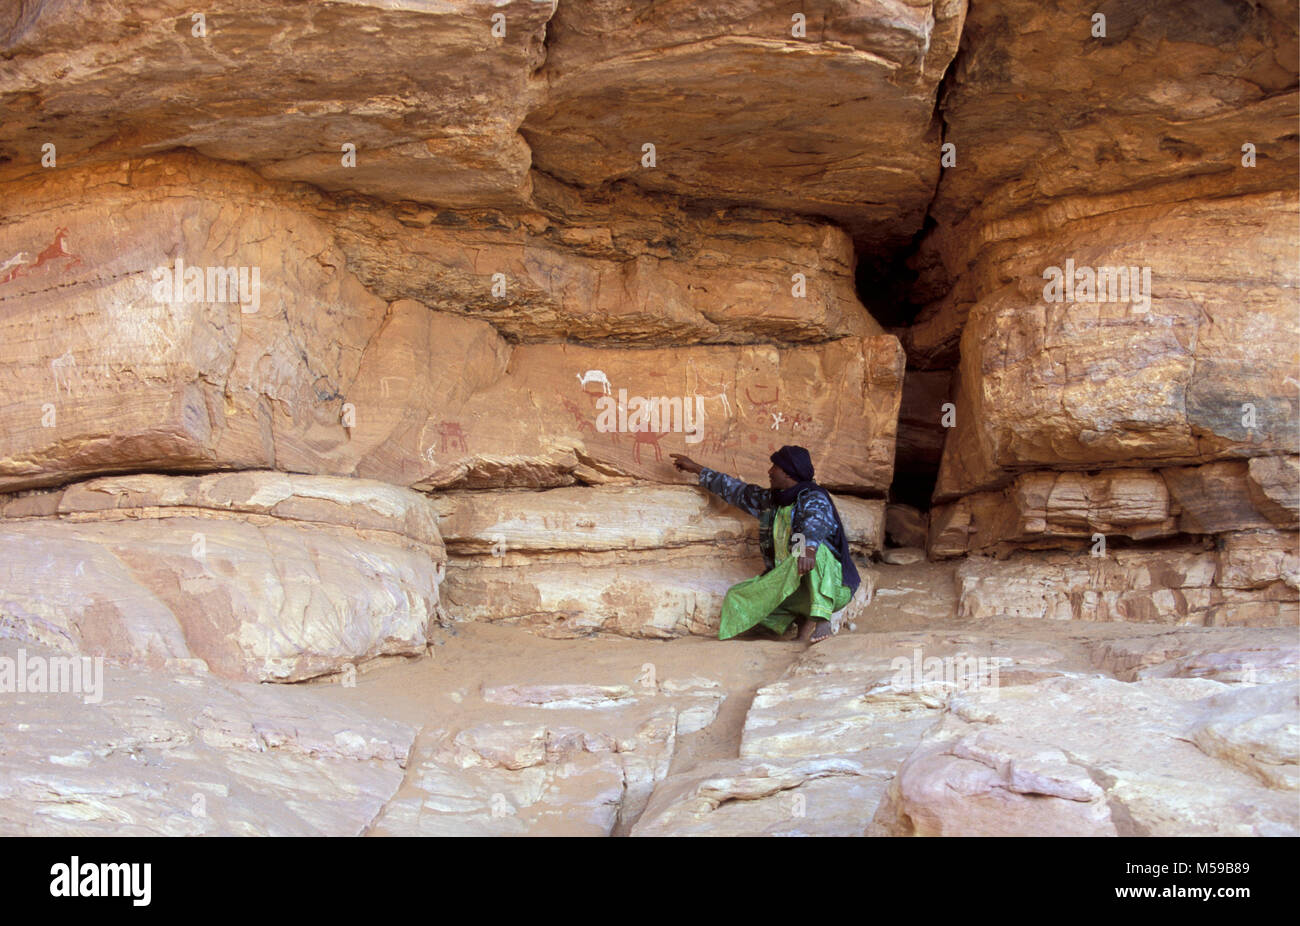 Libya. Ghat. Akakus National Park. Prehistoric rock art paintings. Rock-Art Sites of Tadrart Acacus. Tuareg man. - Stock Image